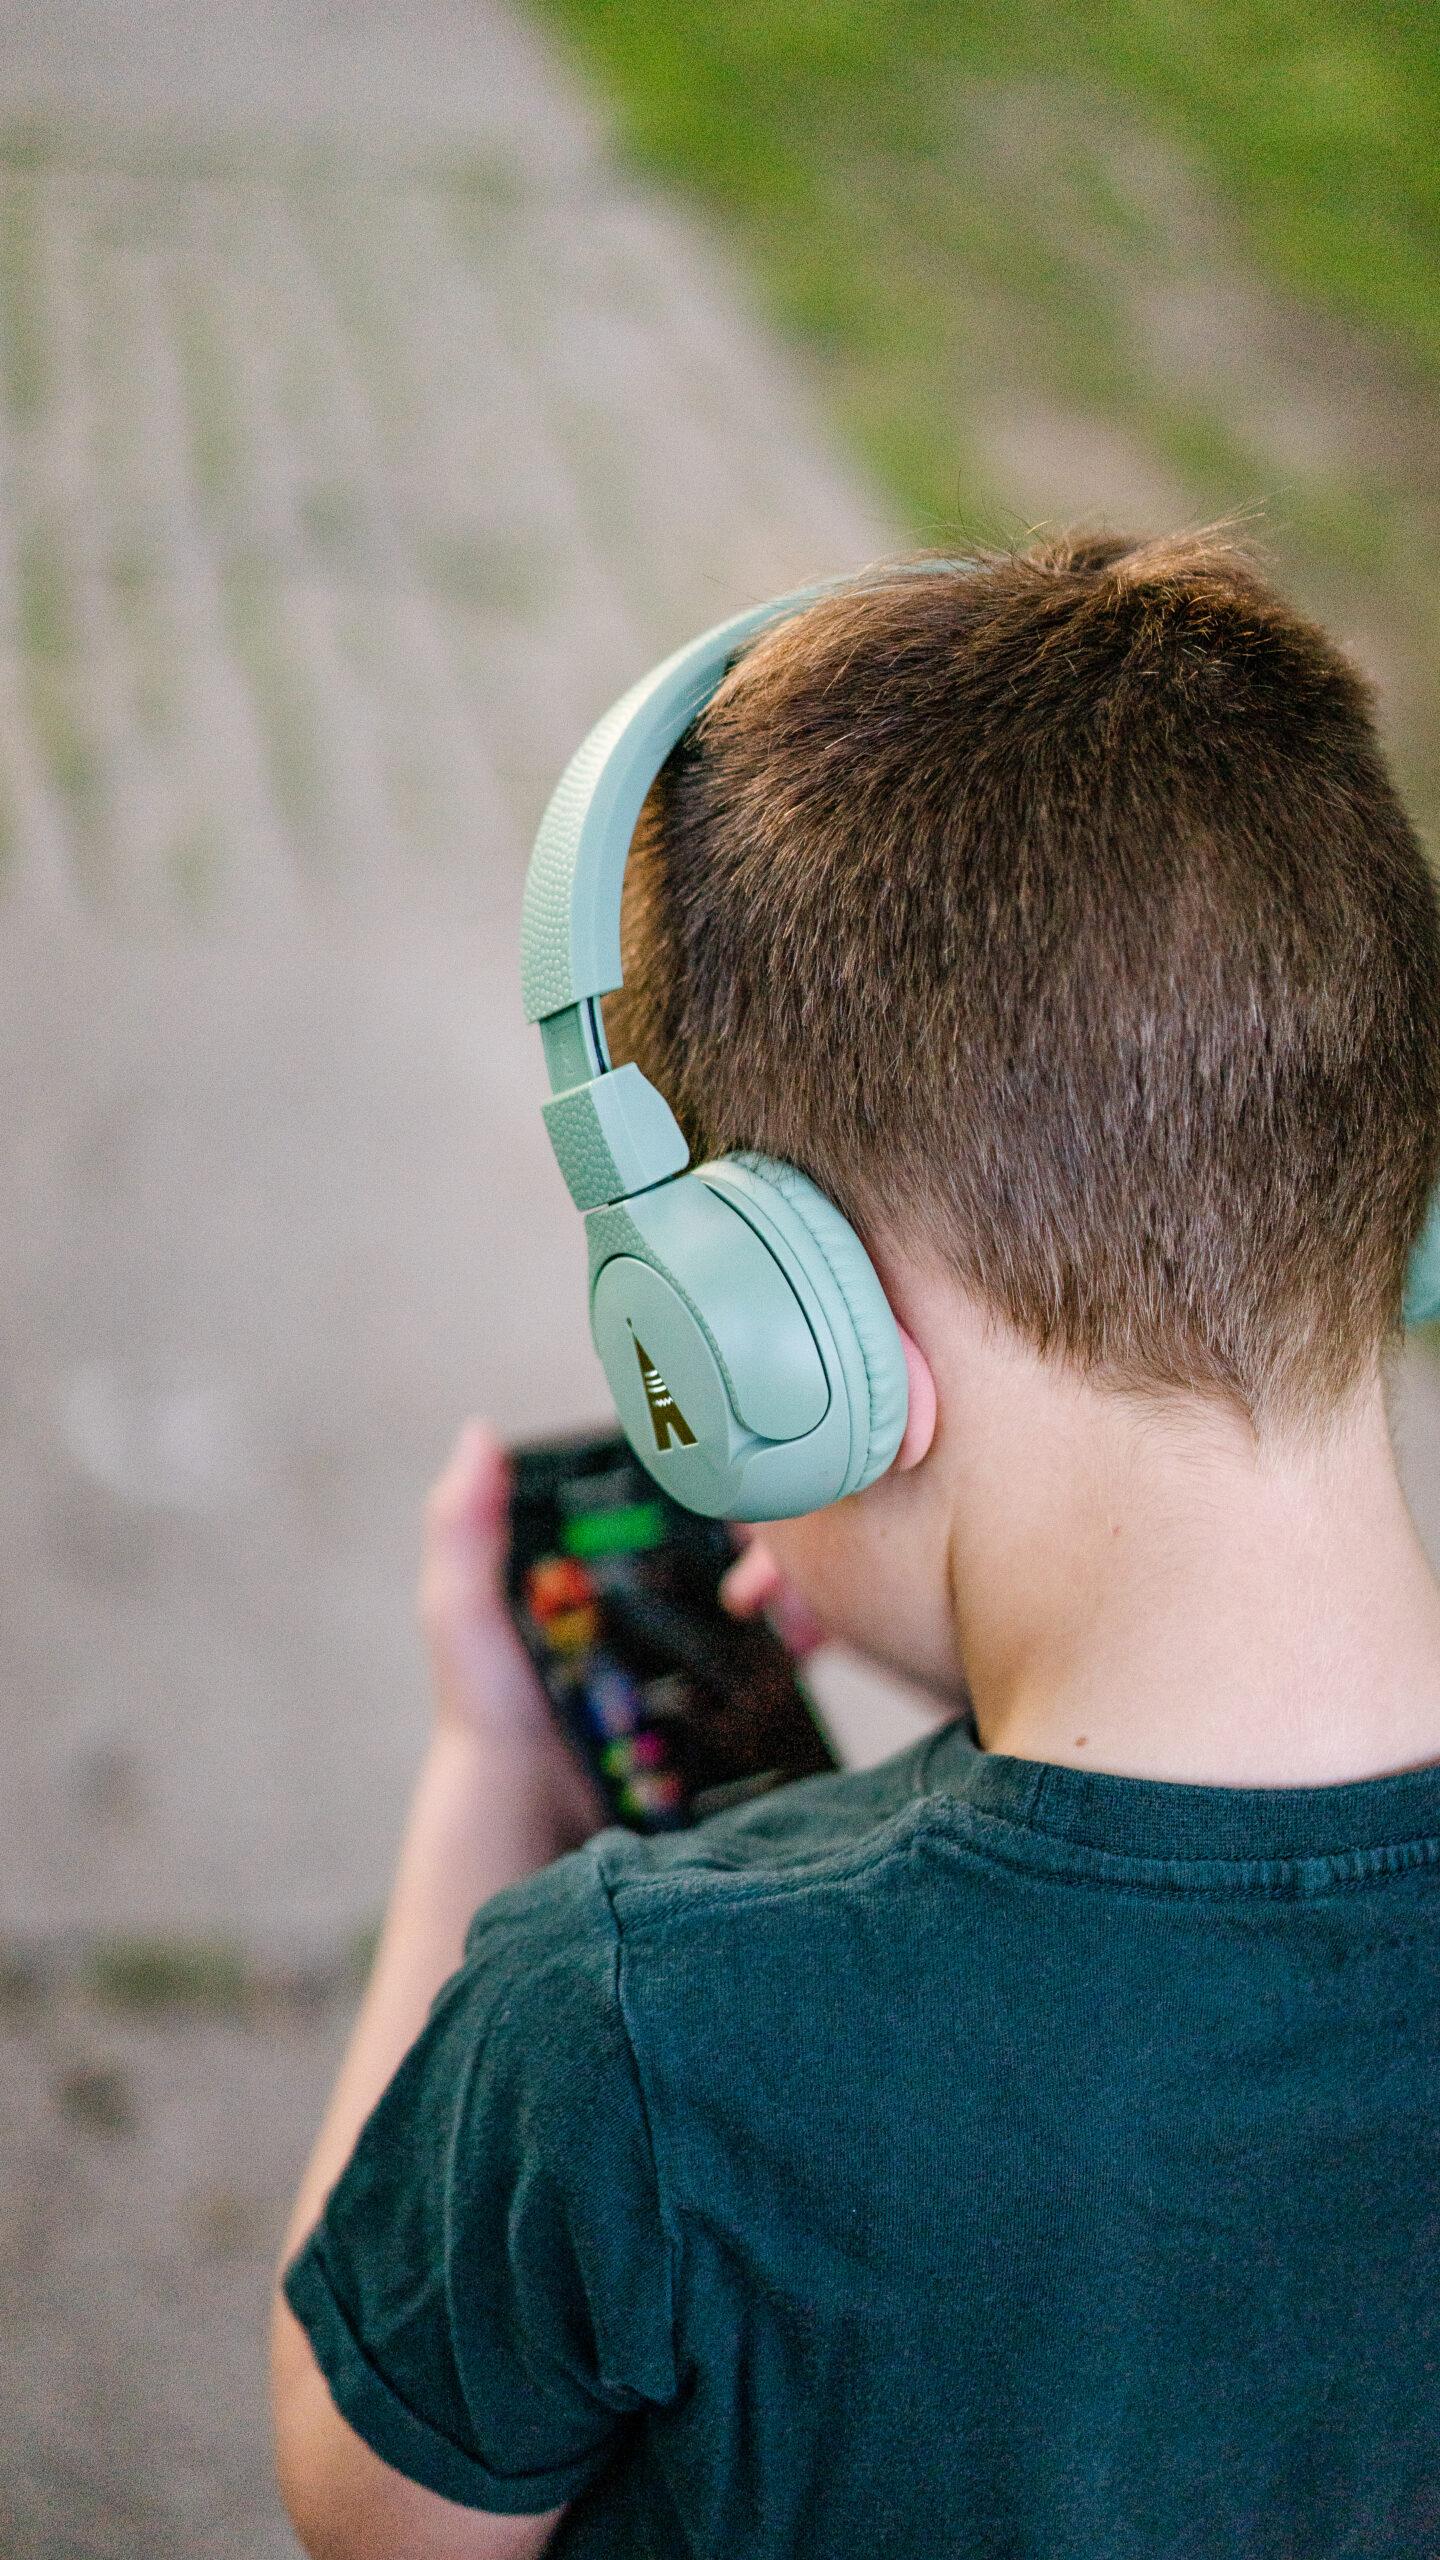 Review POGS Headphone